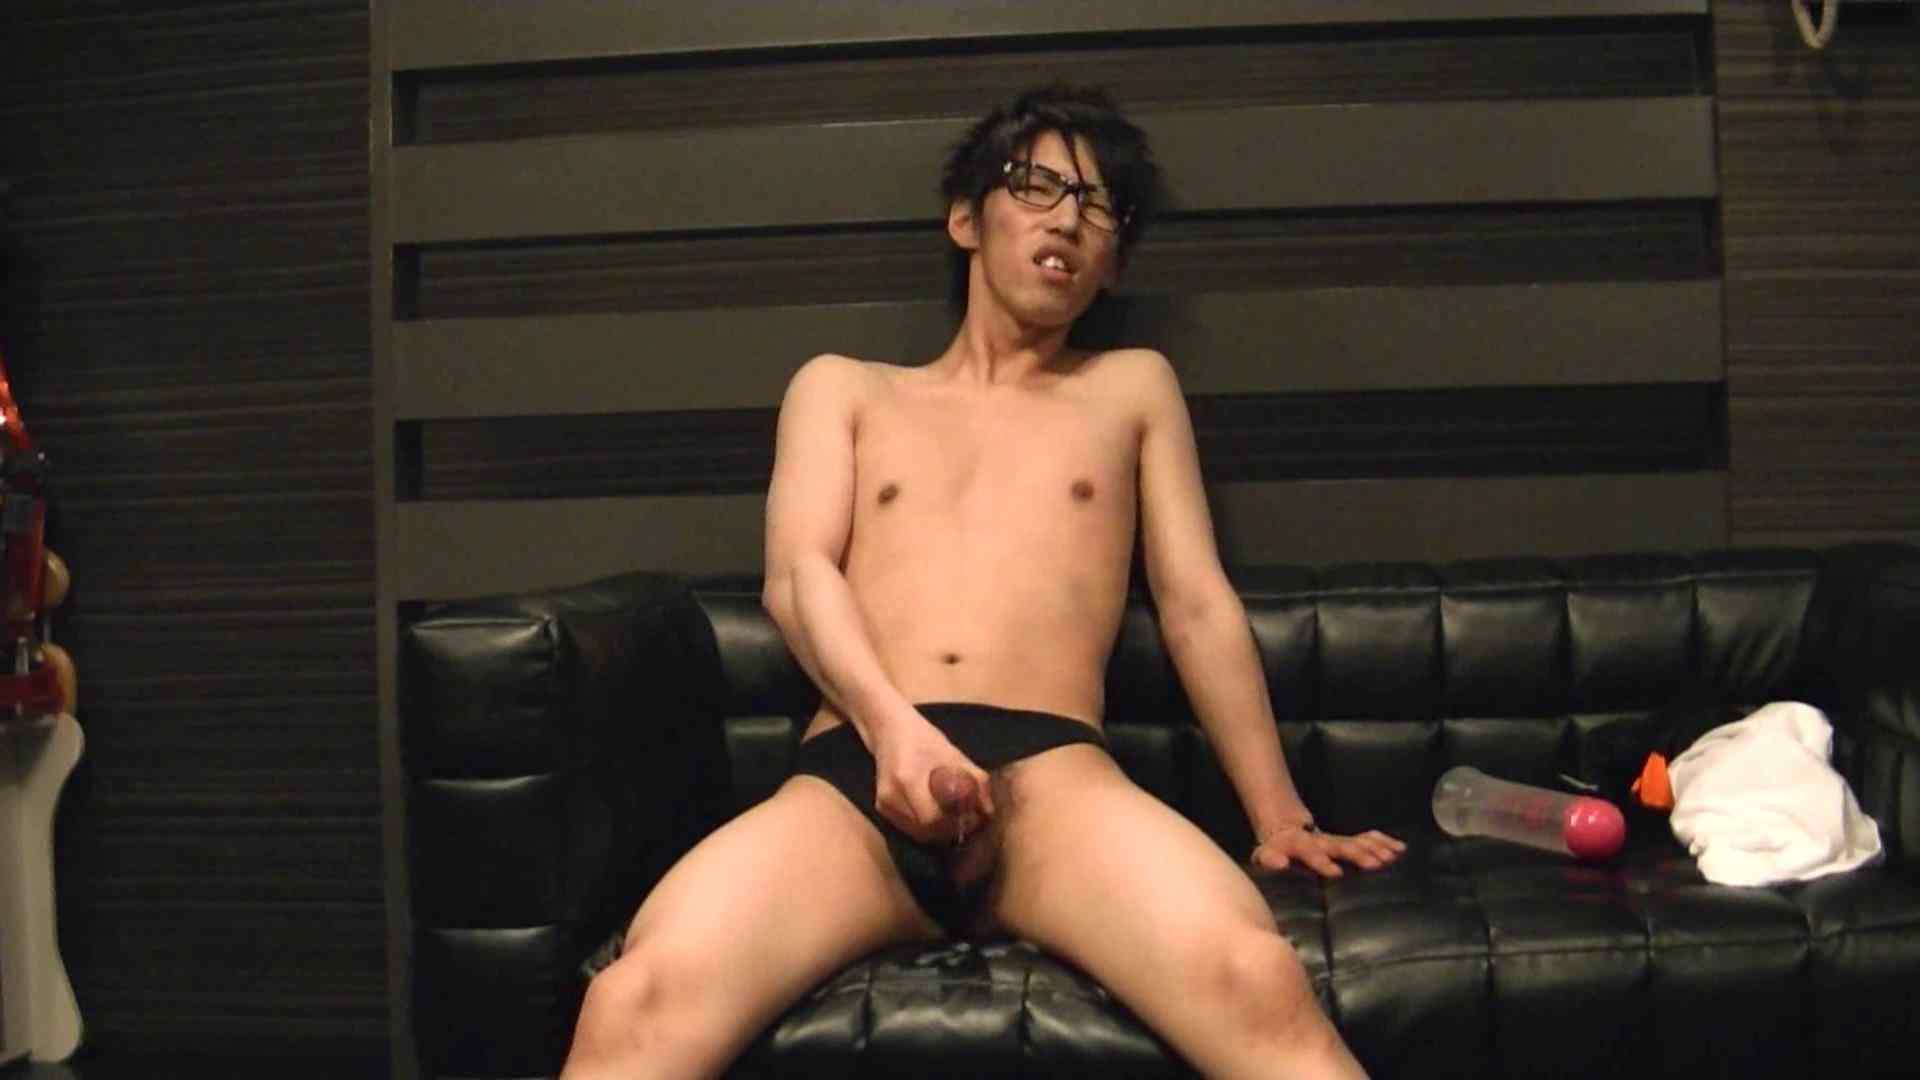 ONA見せカーニバル!! Vol3 男  93pic 17